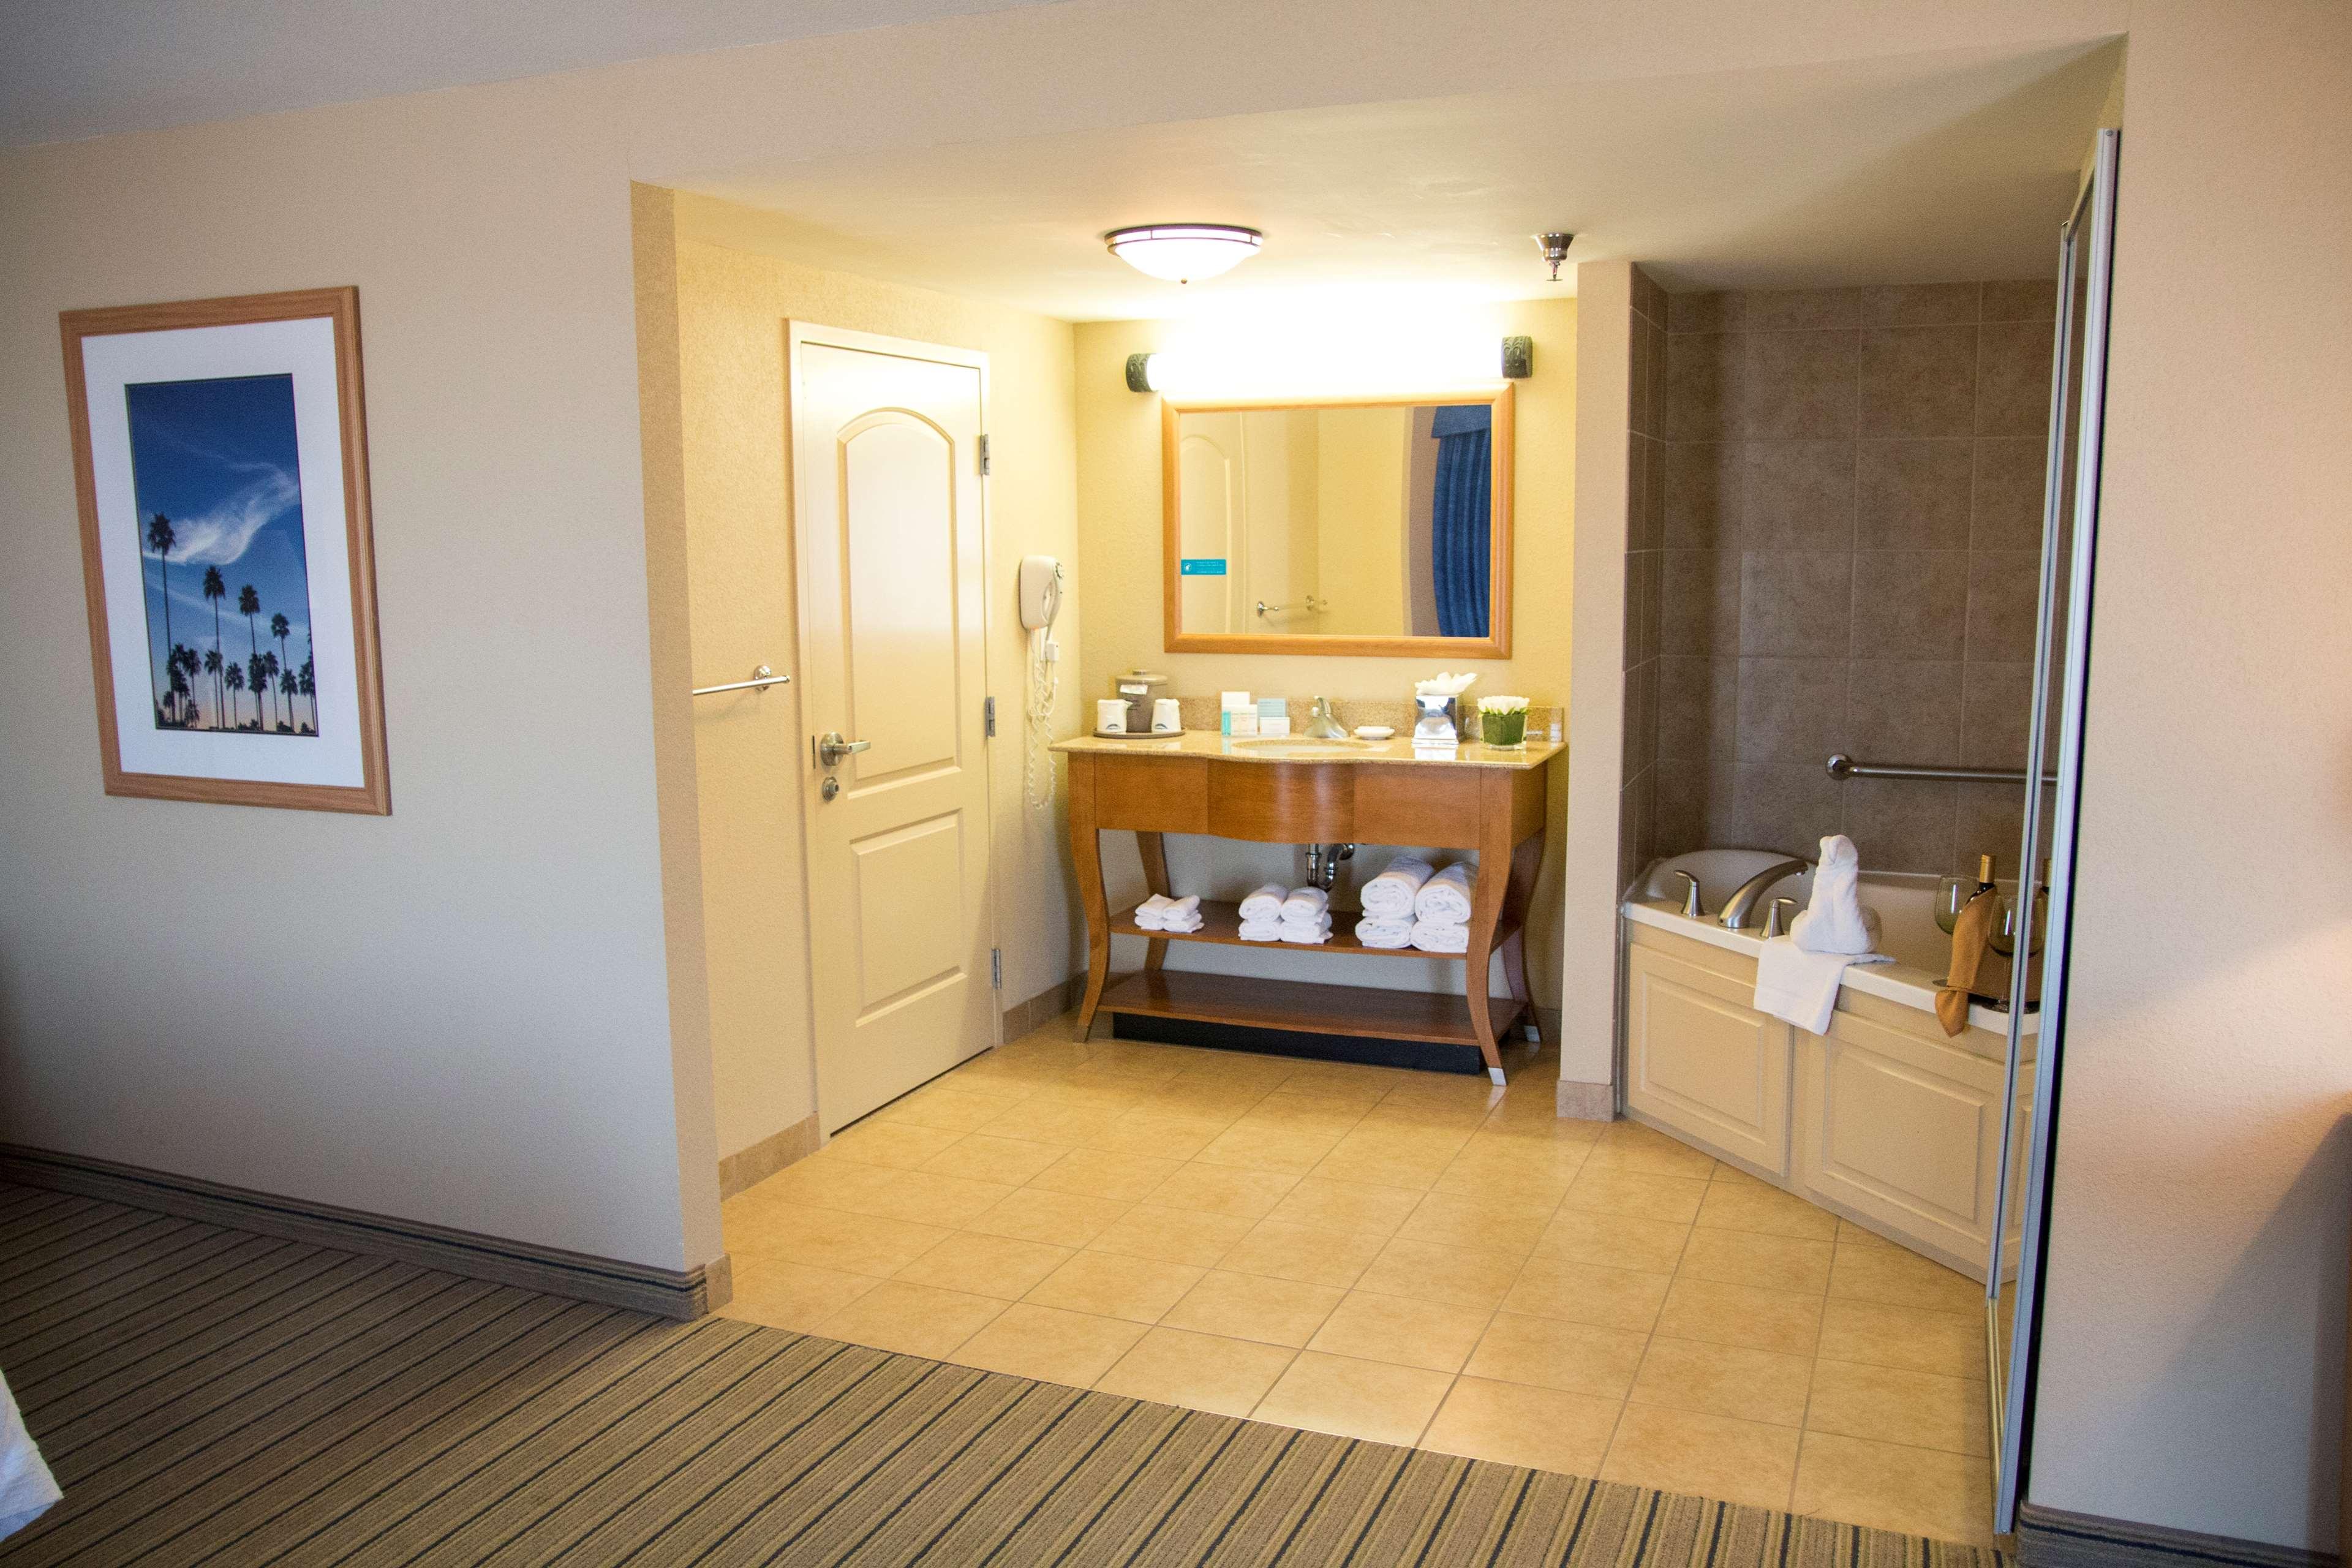 Hampton Inn & Suites Madera image 33